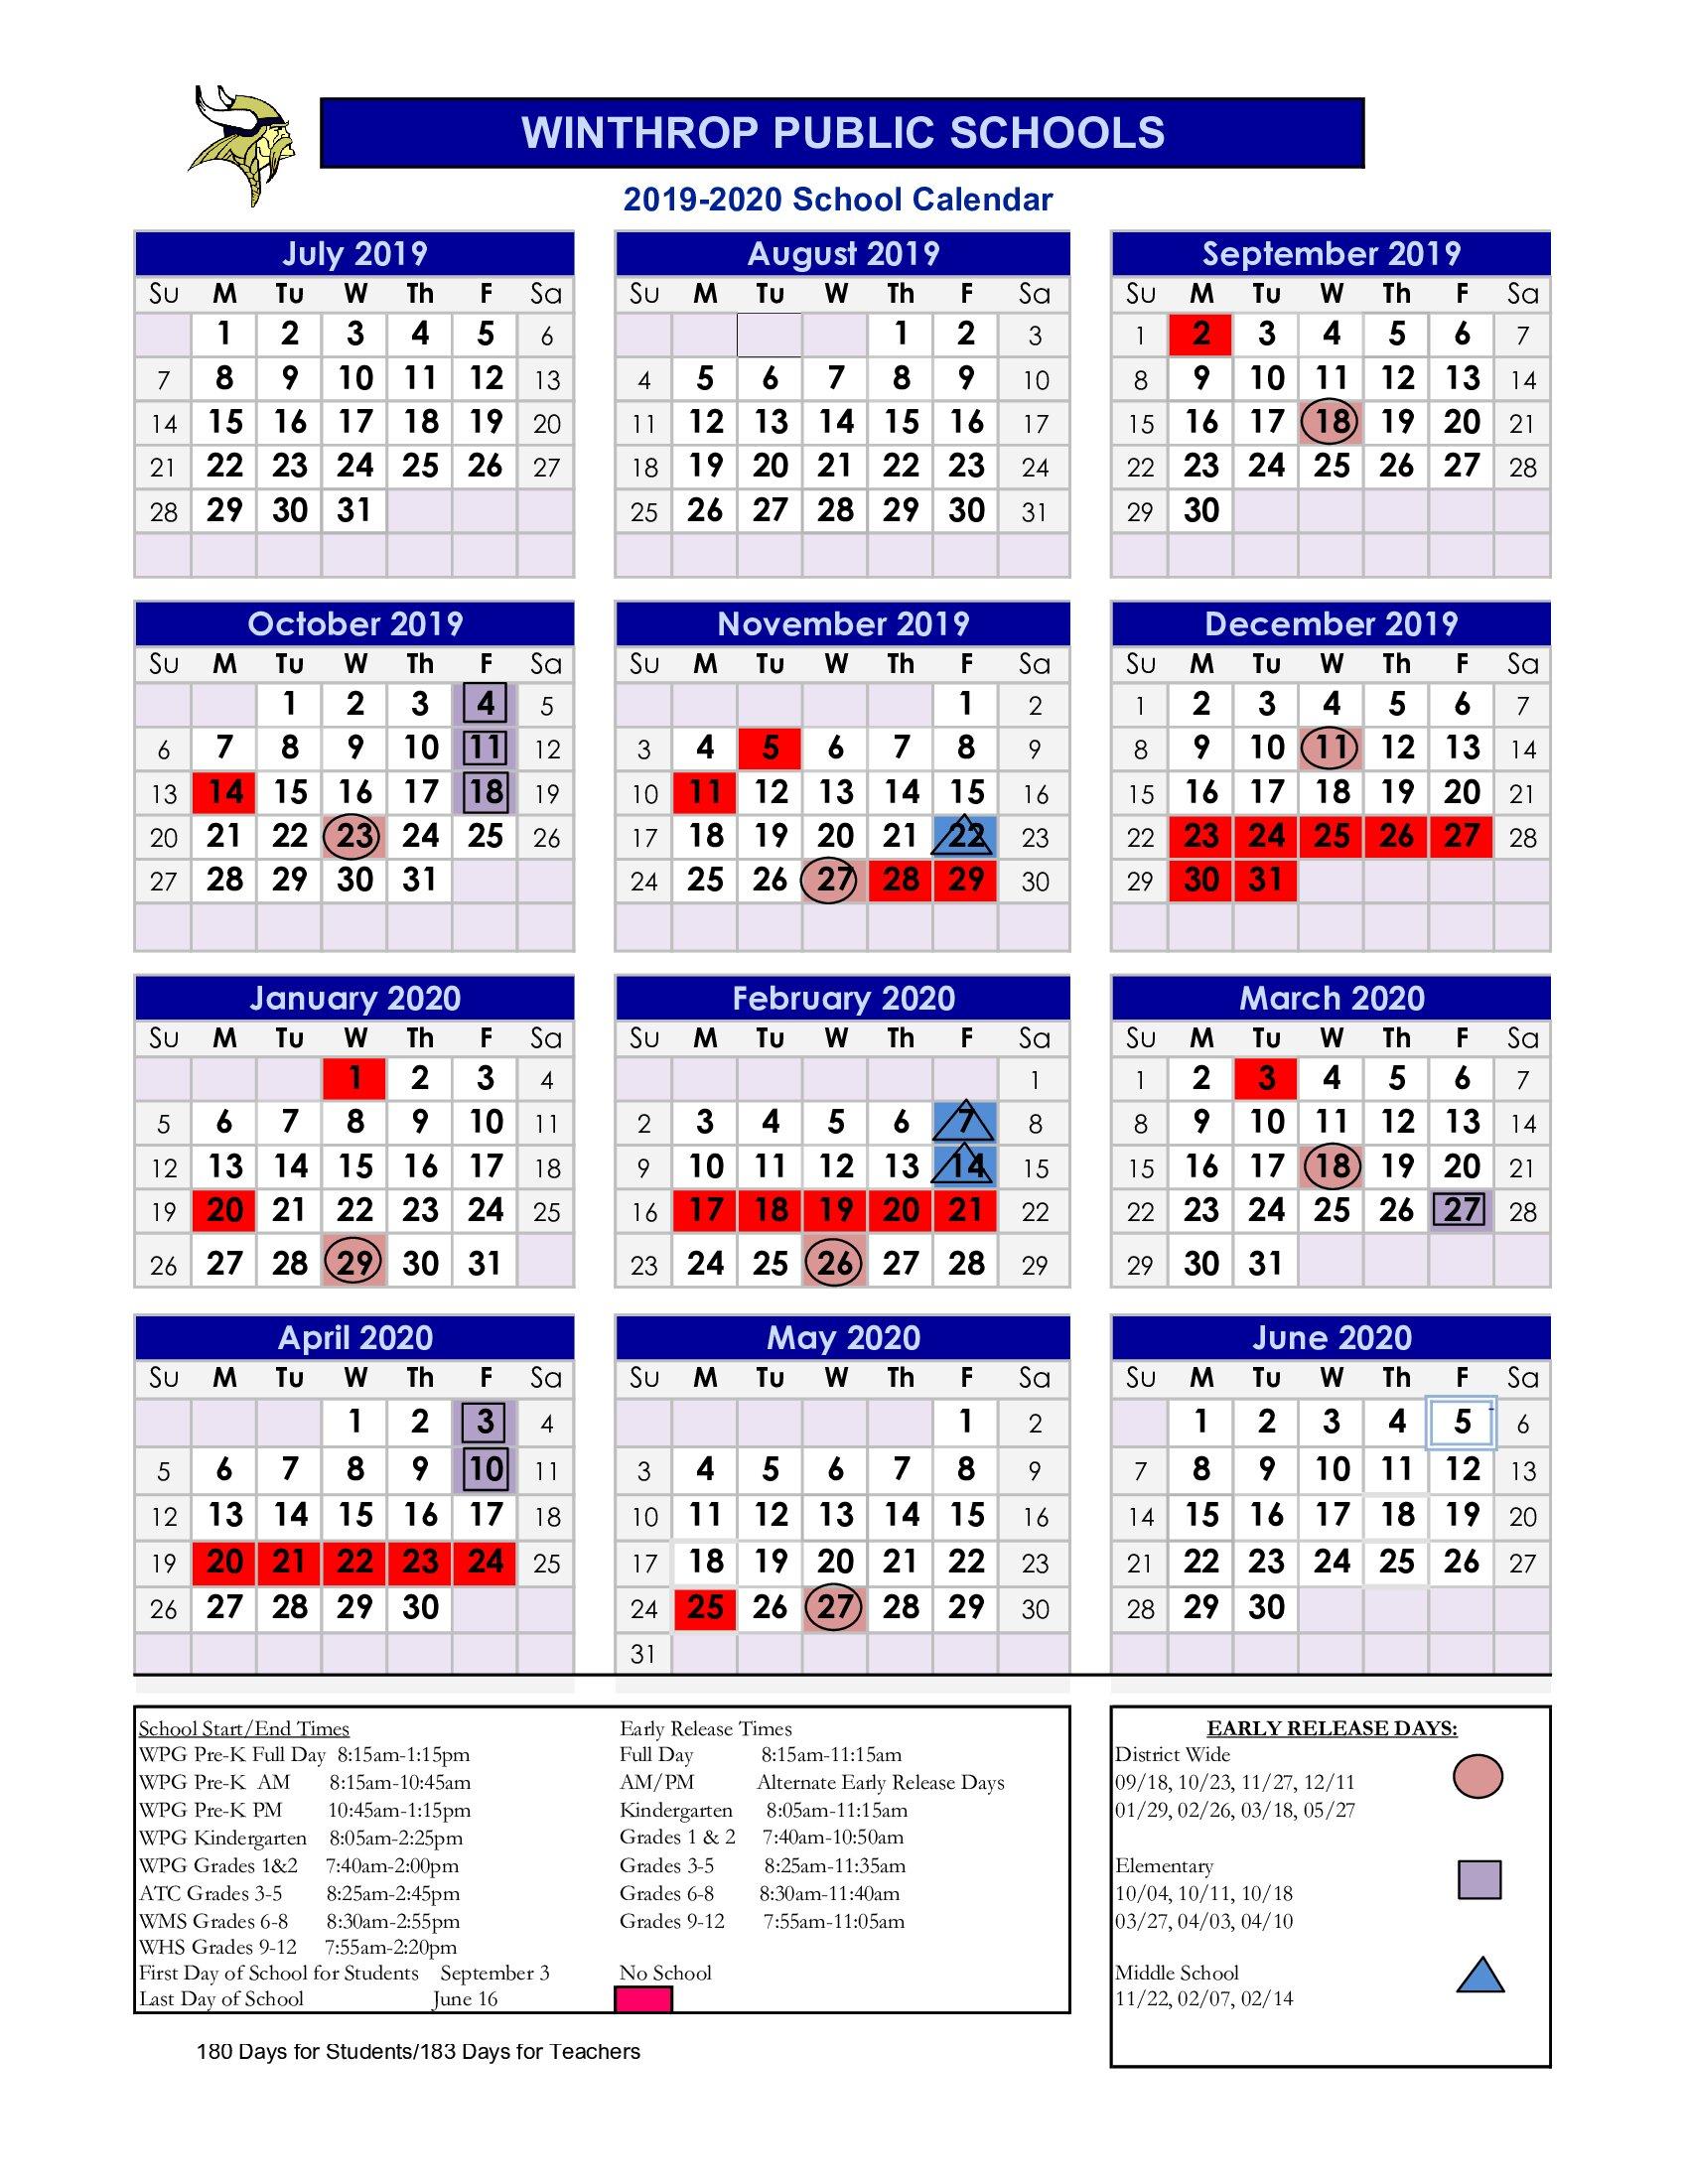 Winthrop Calendar 2019 2019   2020 School Calendar / calendario /calendário / التقويم المدرسي